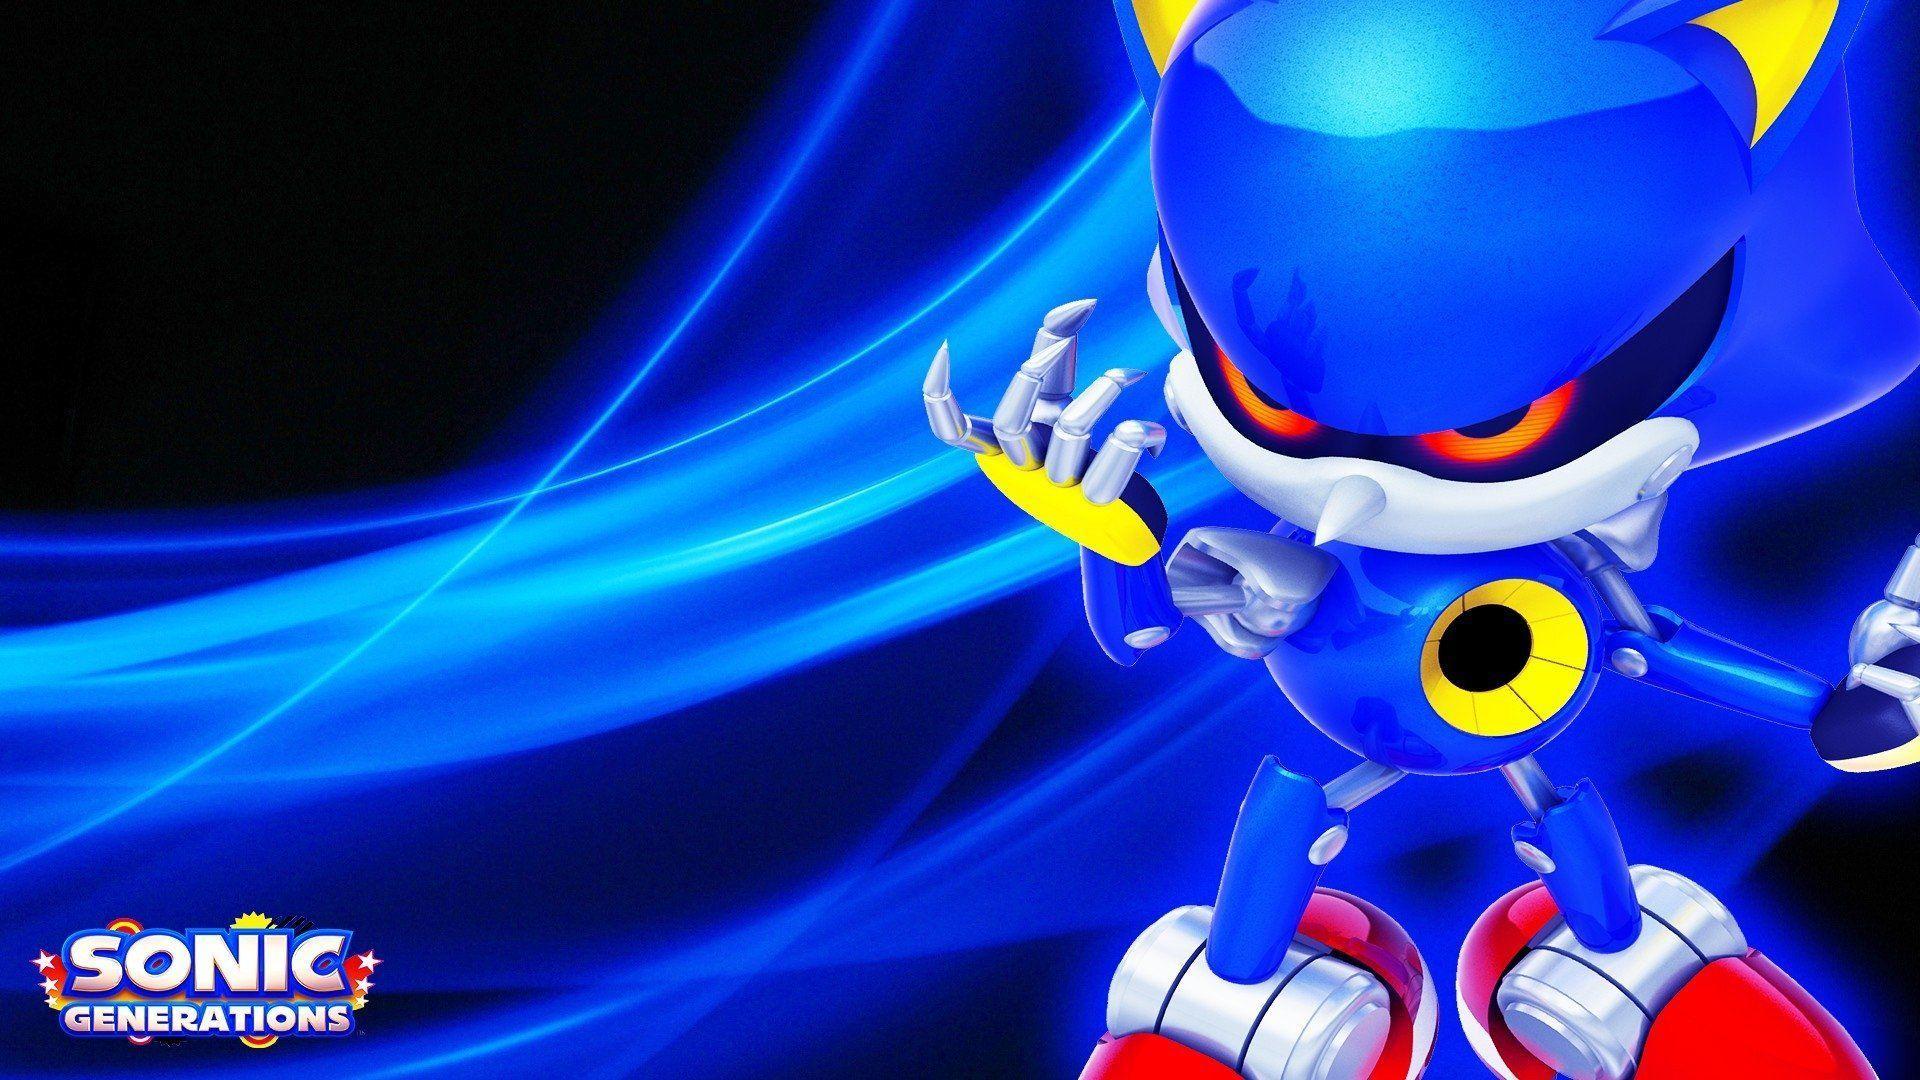 Metal Sonic Wallpapers Top Free Metal Sonic Backgrounds